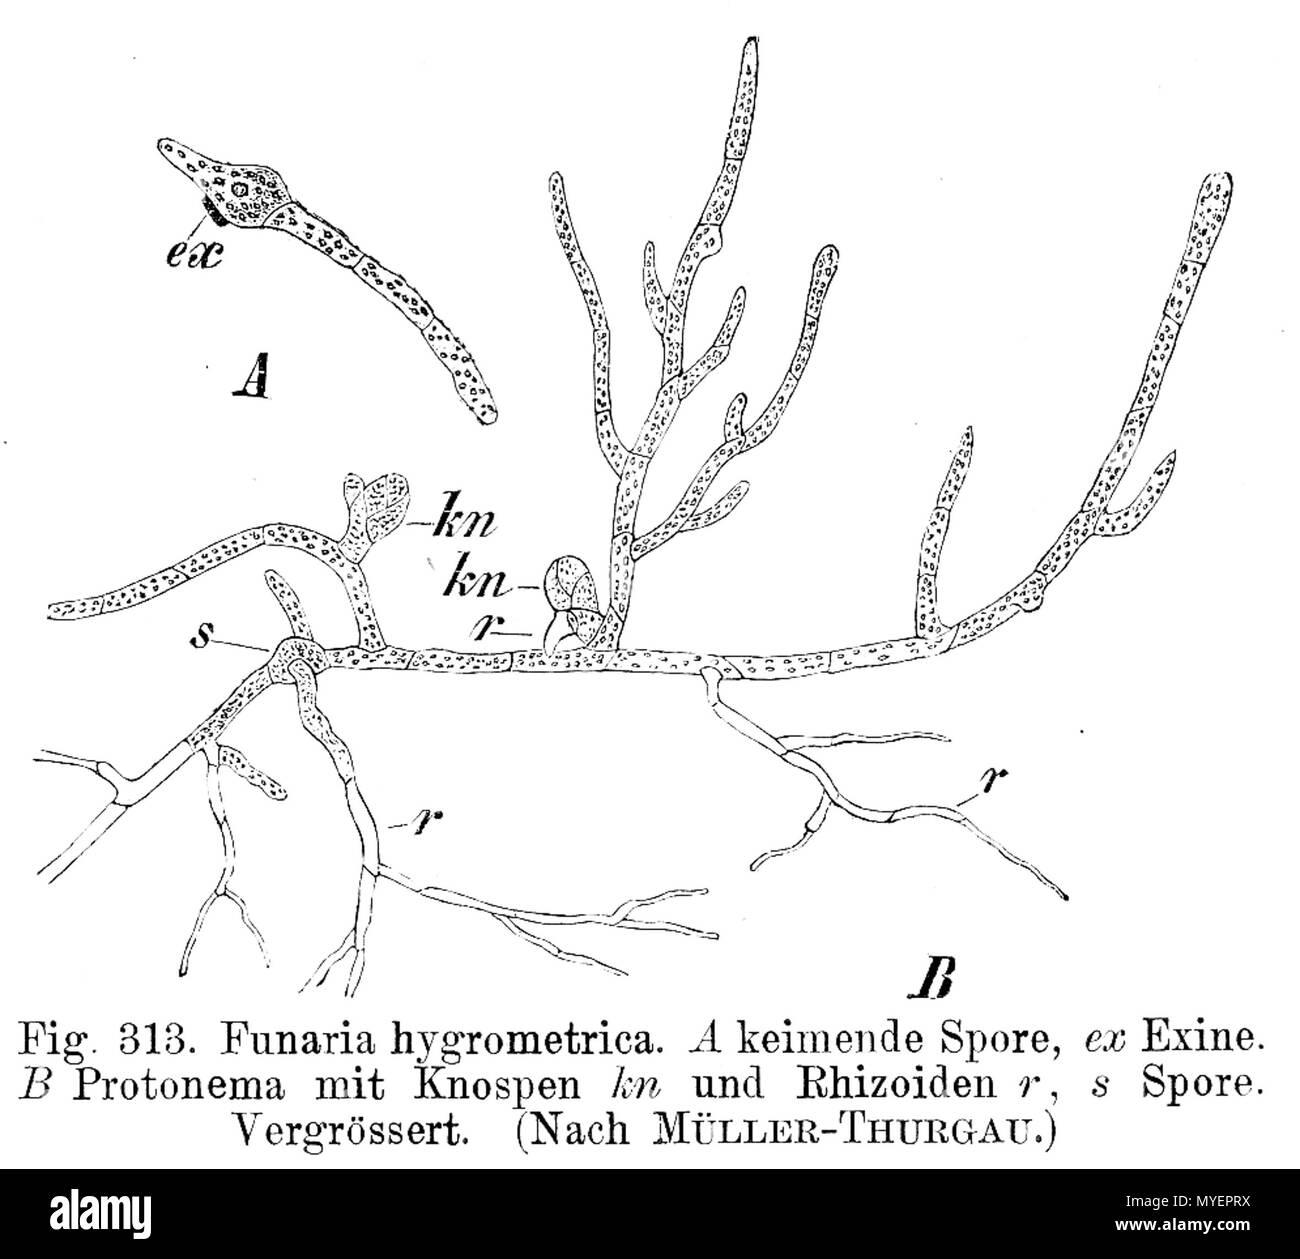 hight resolution of protonema of funaria hygrometrica 1900 e strasburger 200 funaria hygrometrica protonema strasburger1900